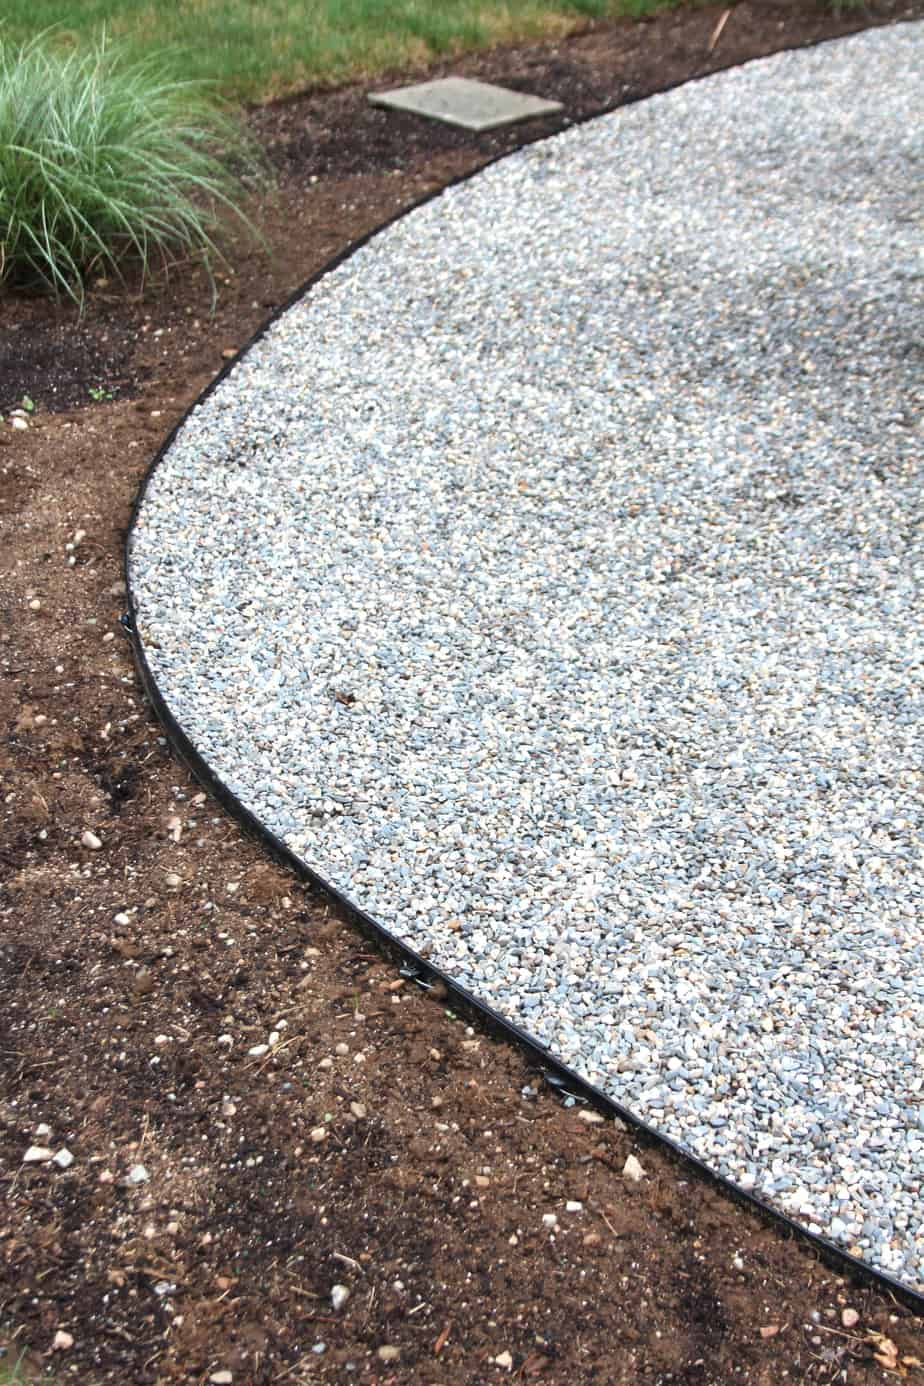 Metal edging keeps landscaping materials neat.